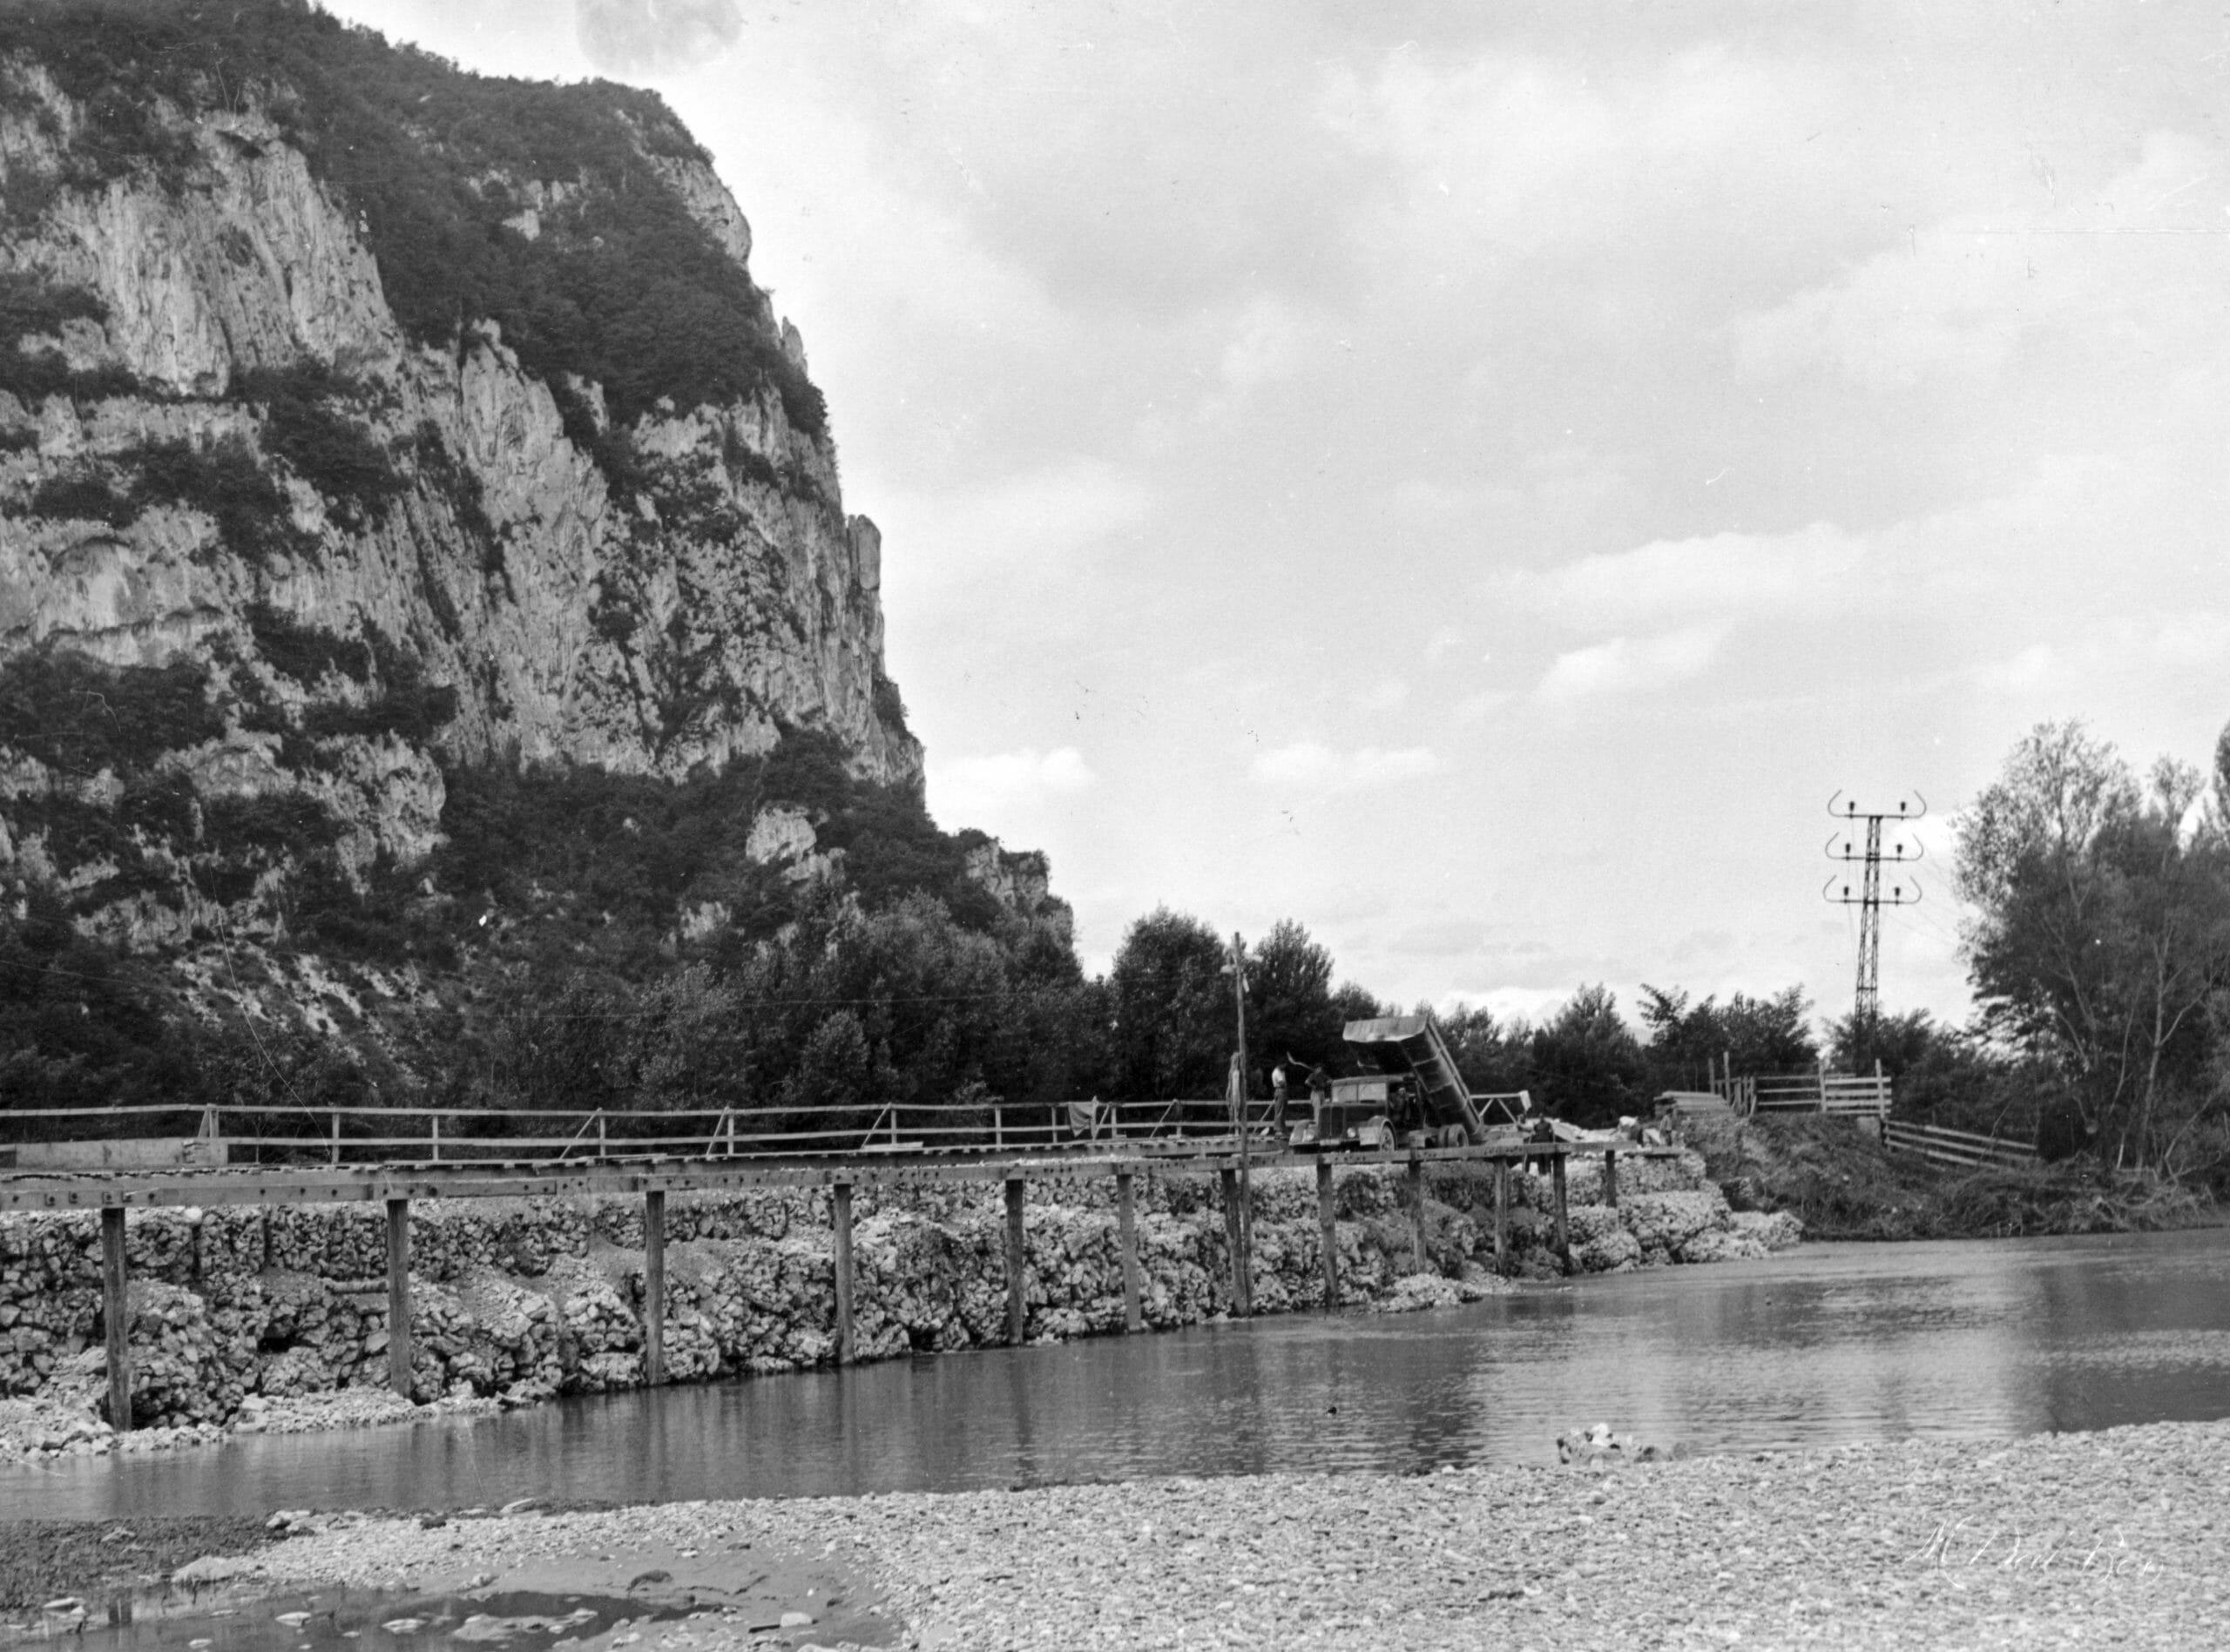 BRECHE PALLUEL TRAVAUX 6 CRUE JUIN 1948 IMAGE VAL BON